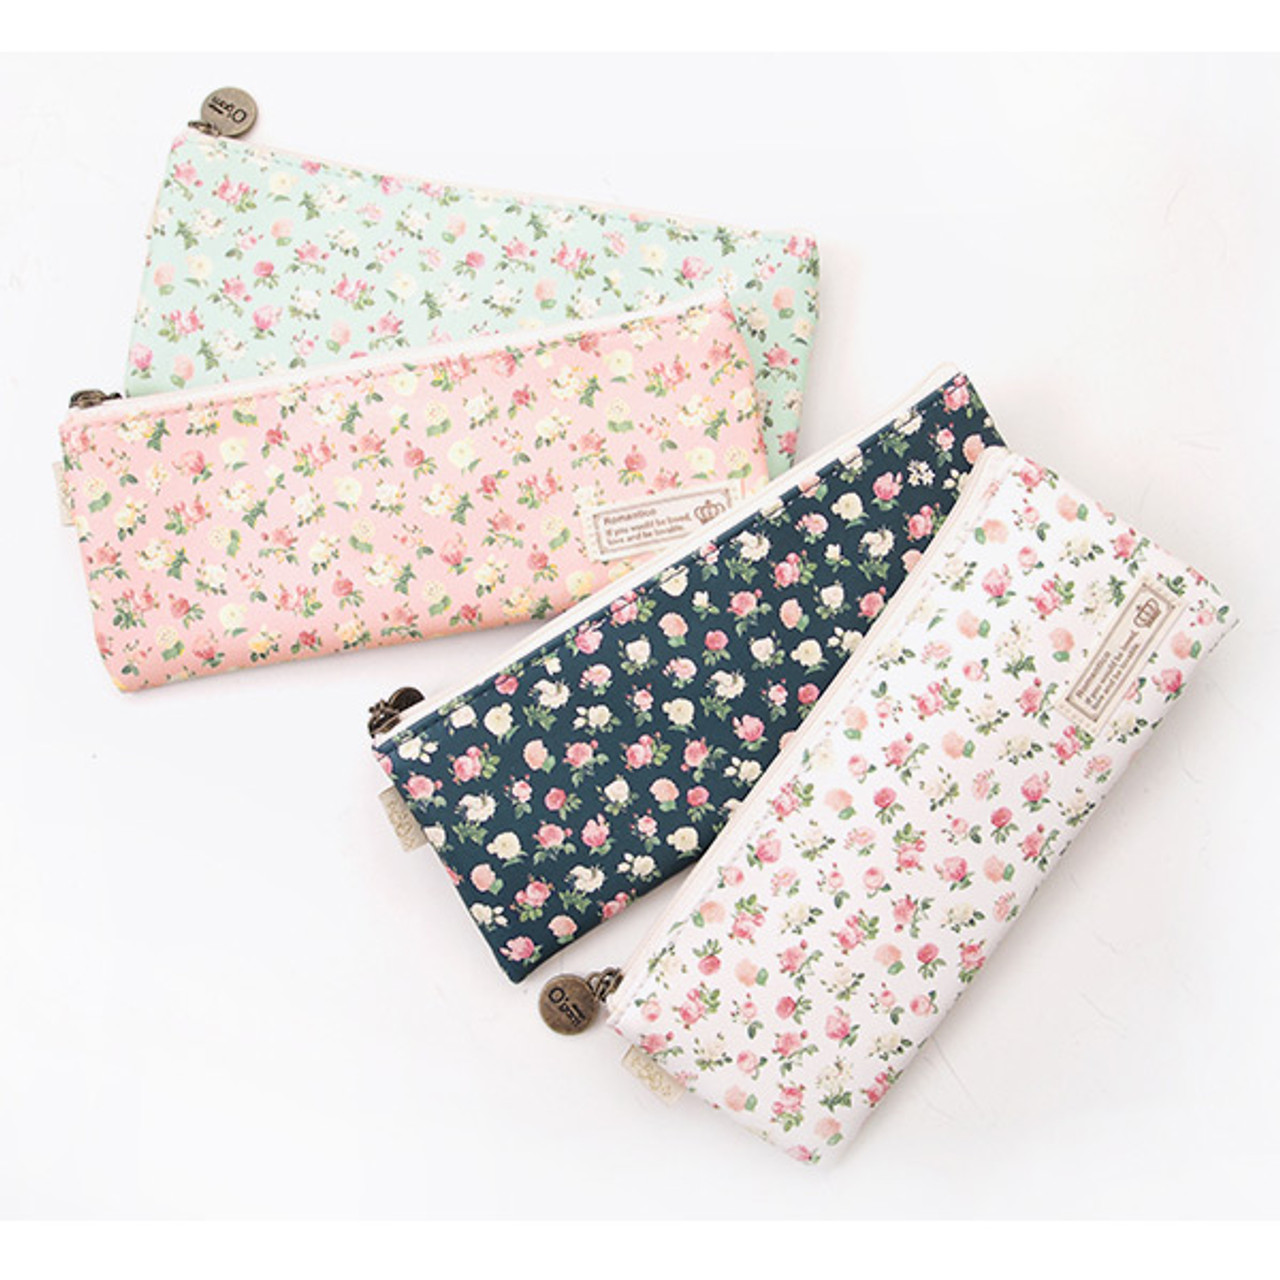 2young flower pattern flat zipper pencil case pouch fallindesign